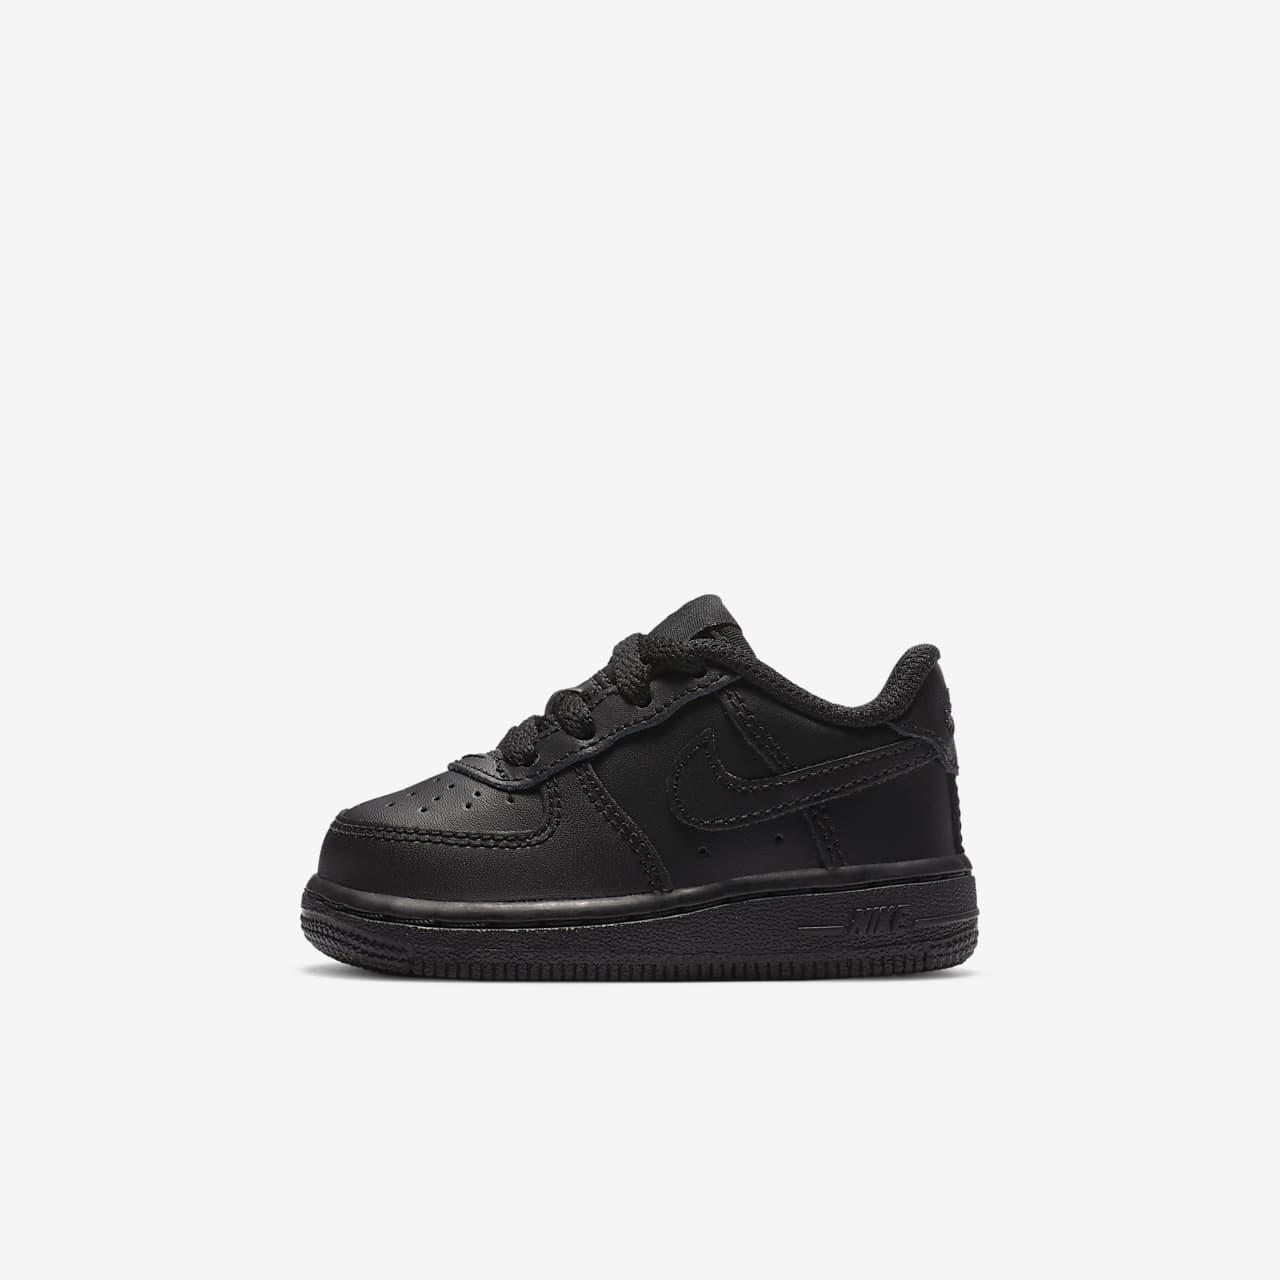 Nike Air Force 1 06 Bebek Ayakkabısı